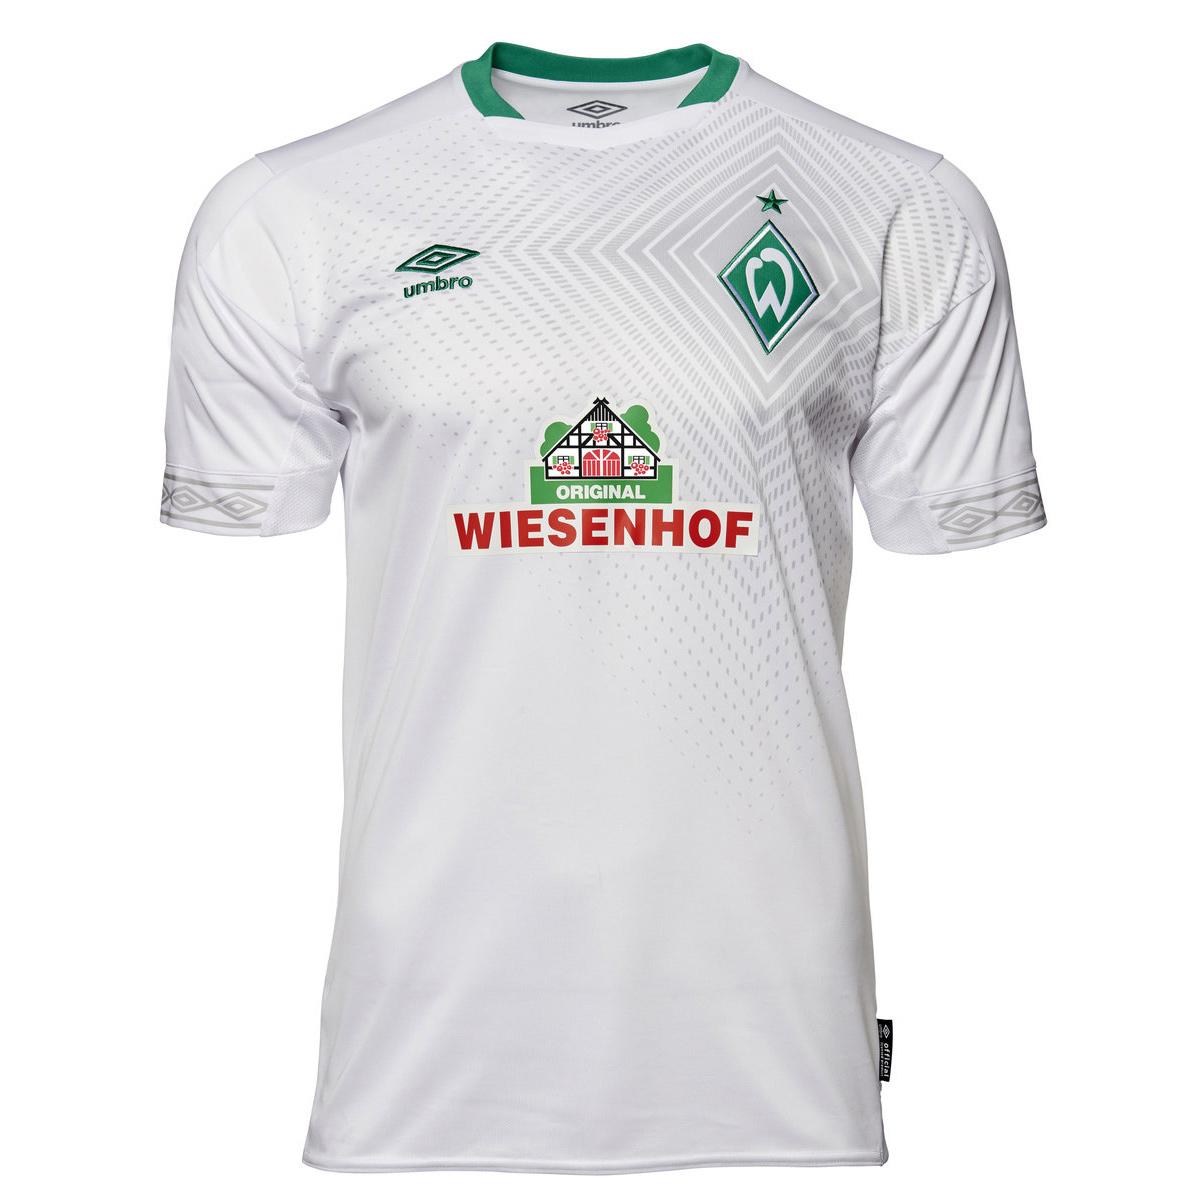 2e9f542e Umbro SV Werder Bremen Herren Event 3rd Ausweichtrikot 18/19 - 79164U weiß